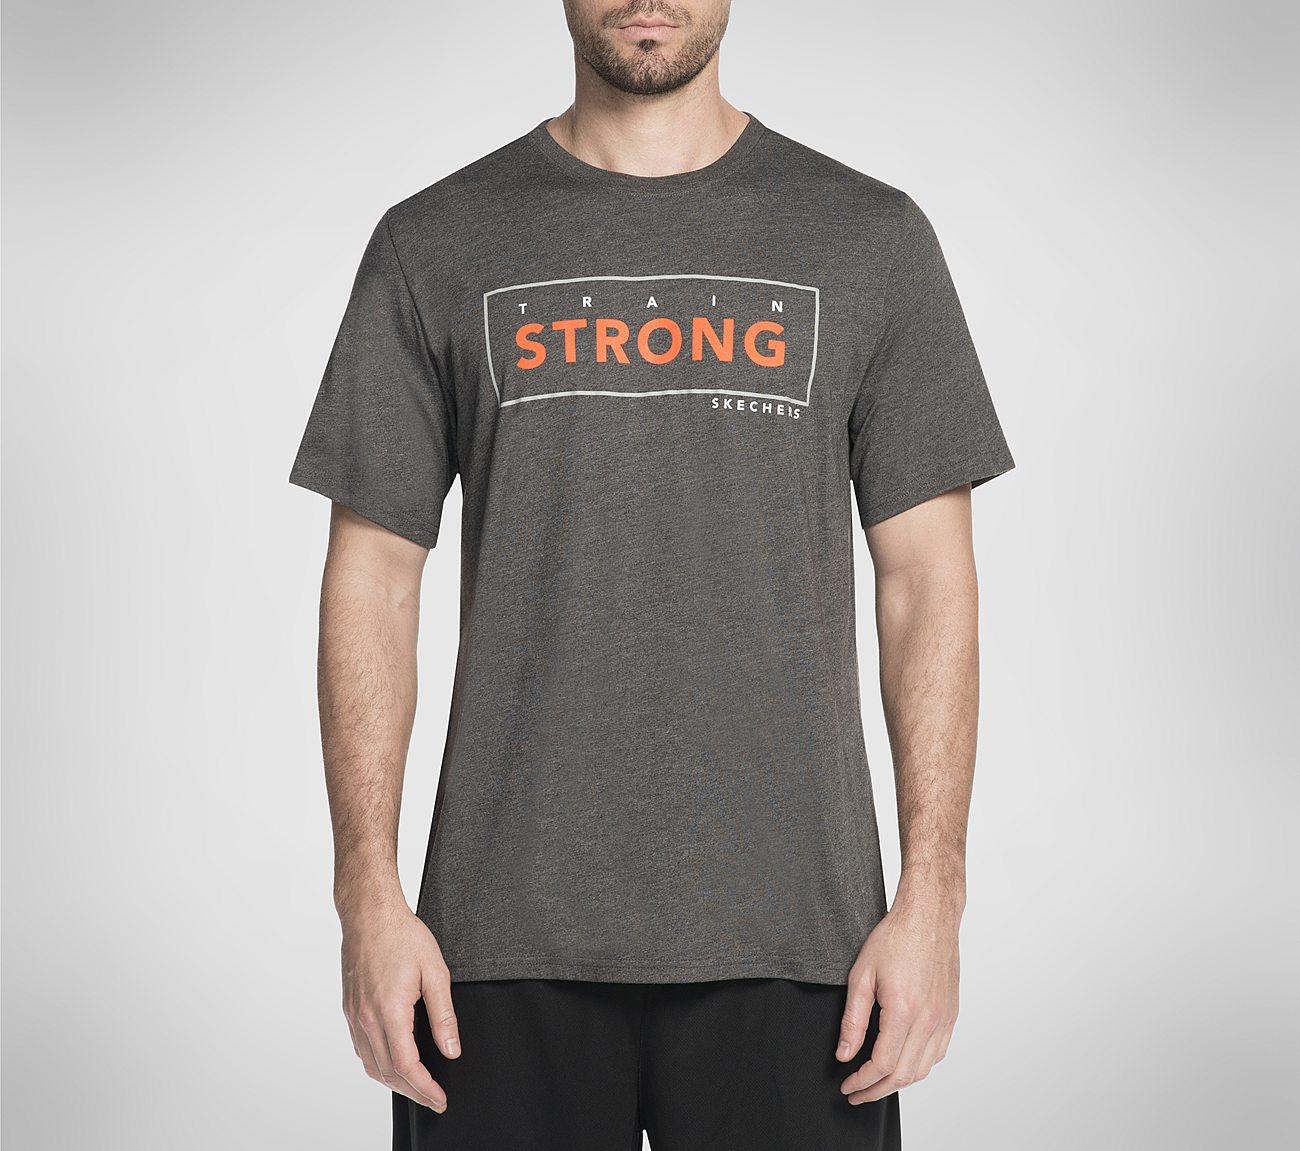 Train Strong Tee Shirt